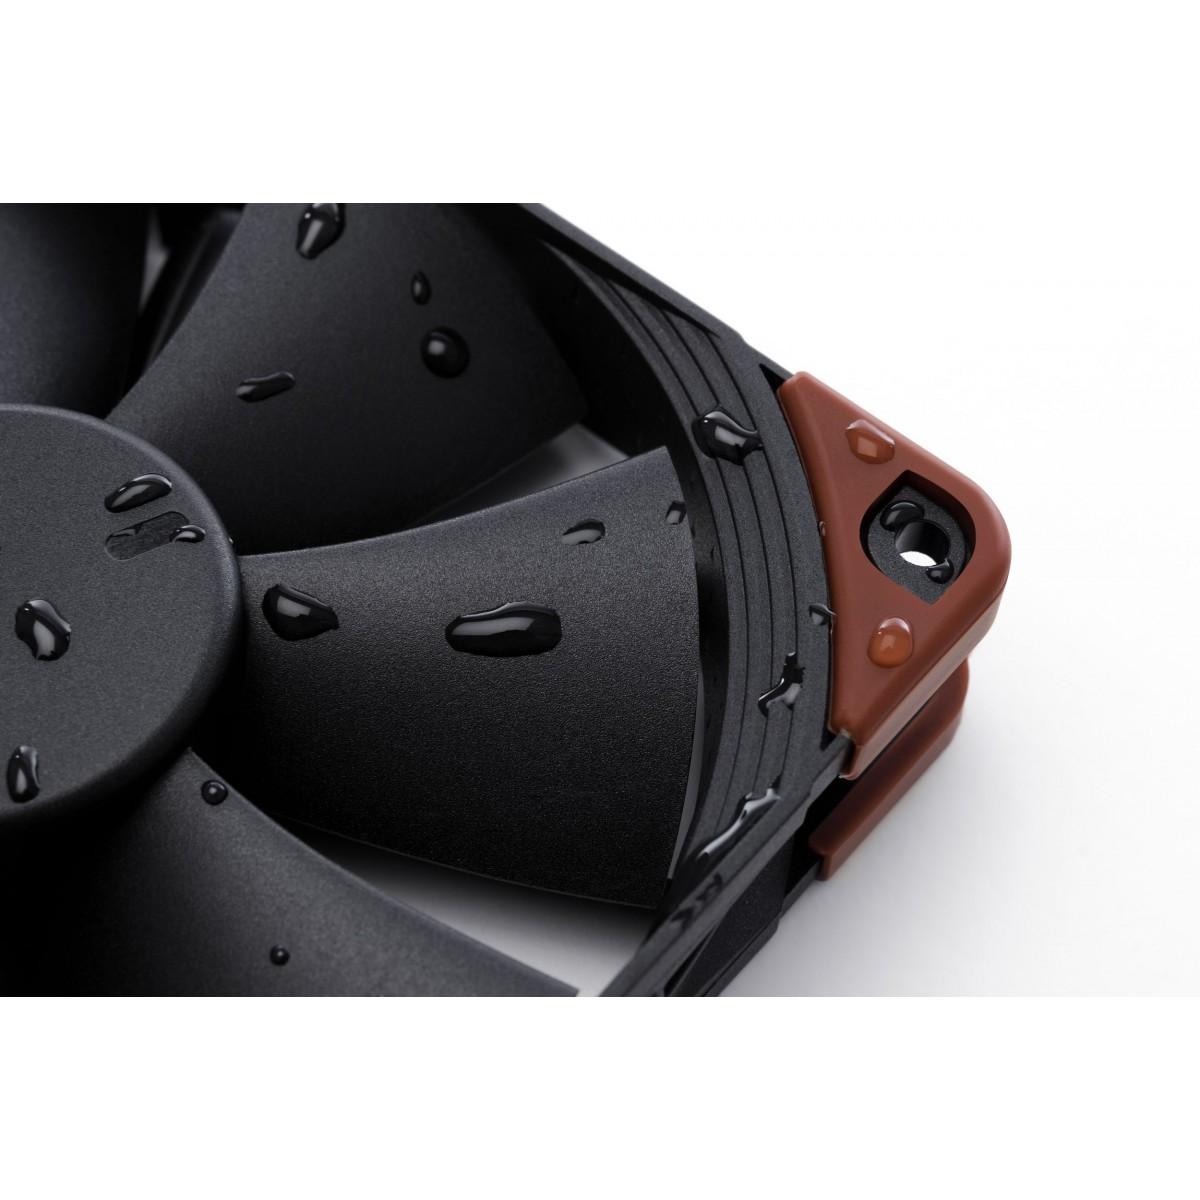 Cooler para Gabinete Noctua NF-F12 industrialPPC-3000 PWM, Black, 120mm, NF-F12 iPPC-3000 PWM